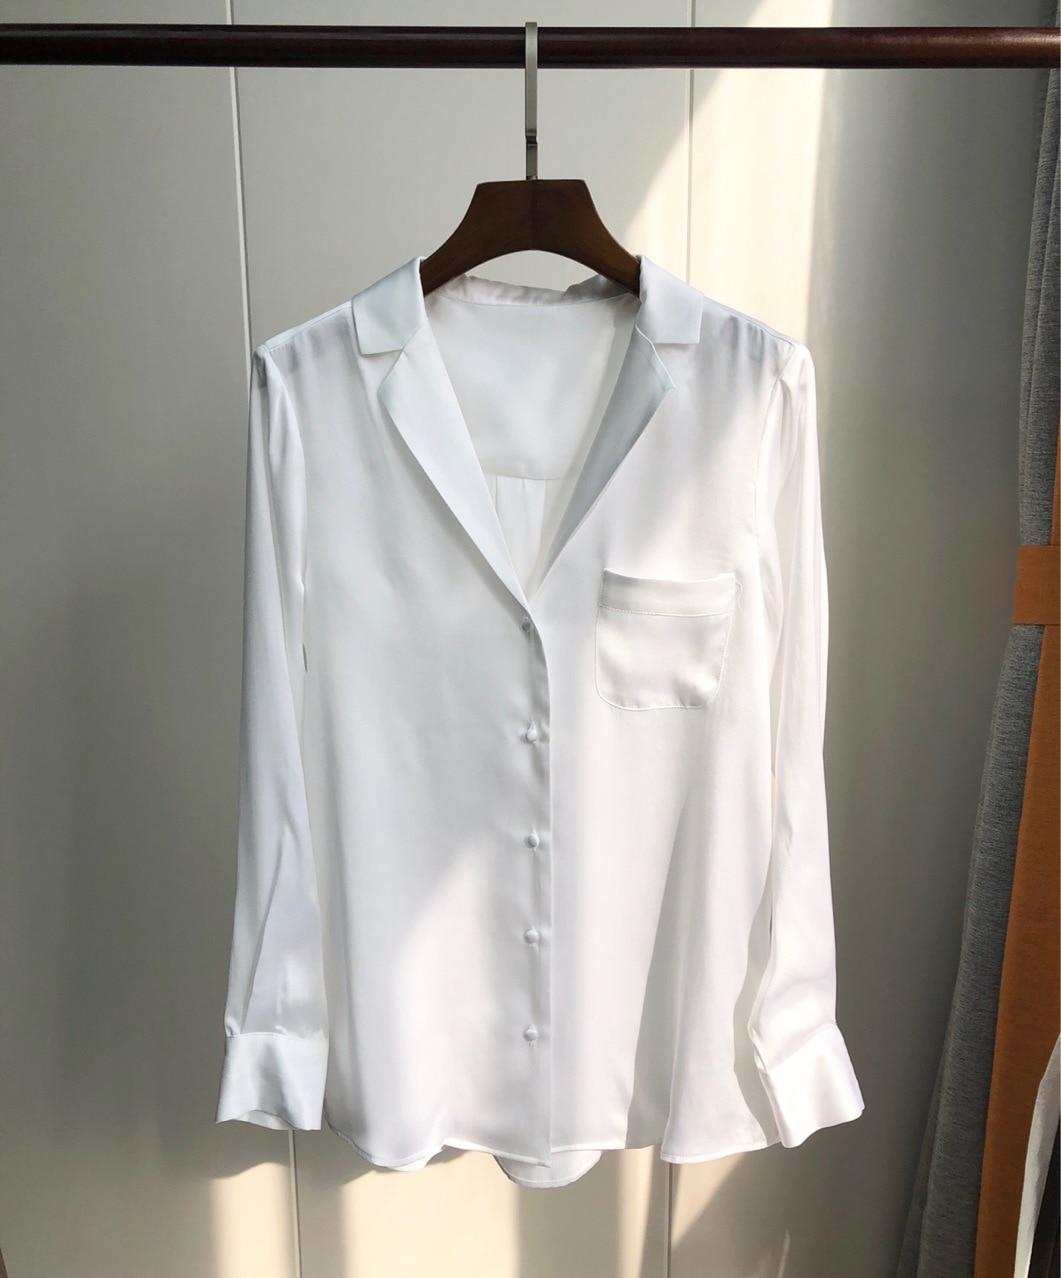 Women Shirt Plain Satin White Soft Sand Wash Covered Button Shirt